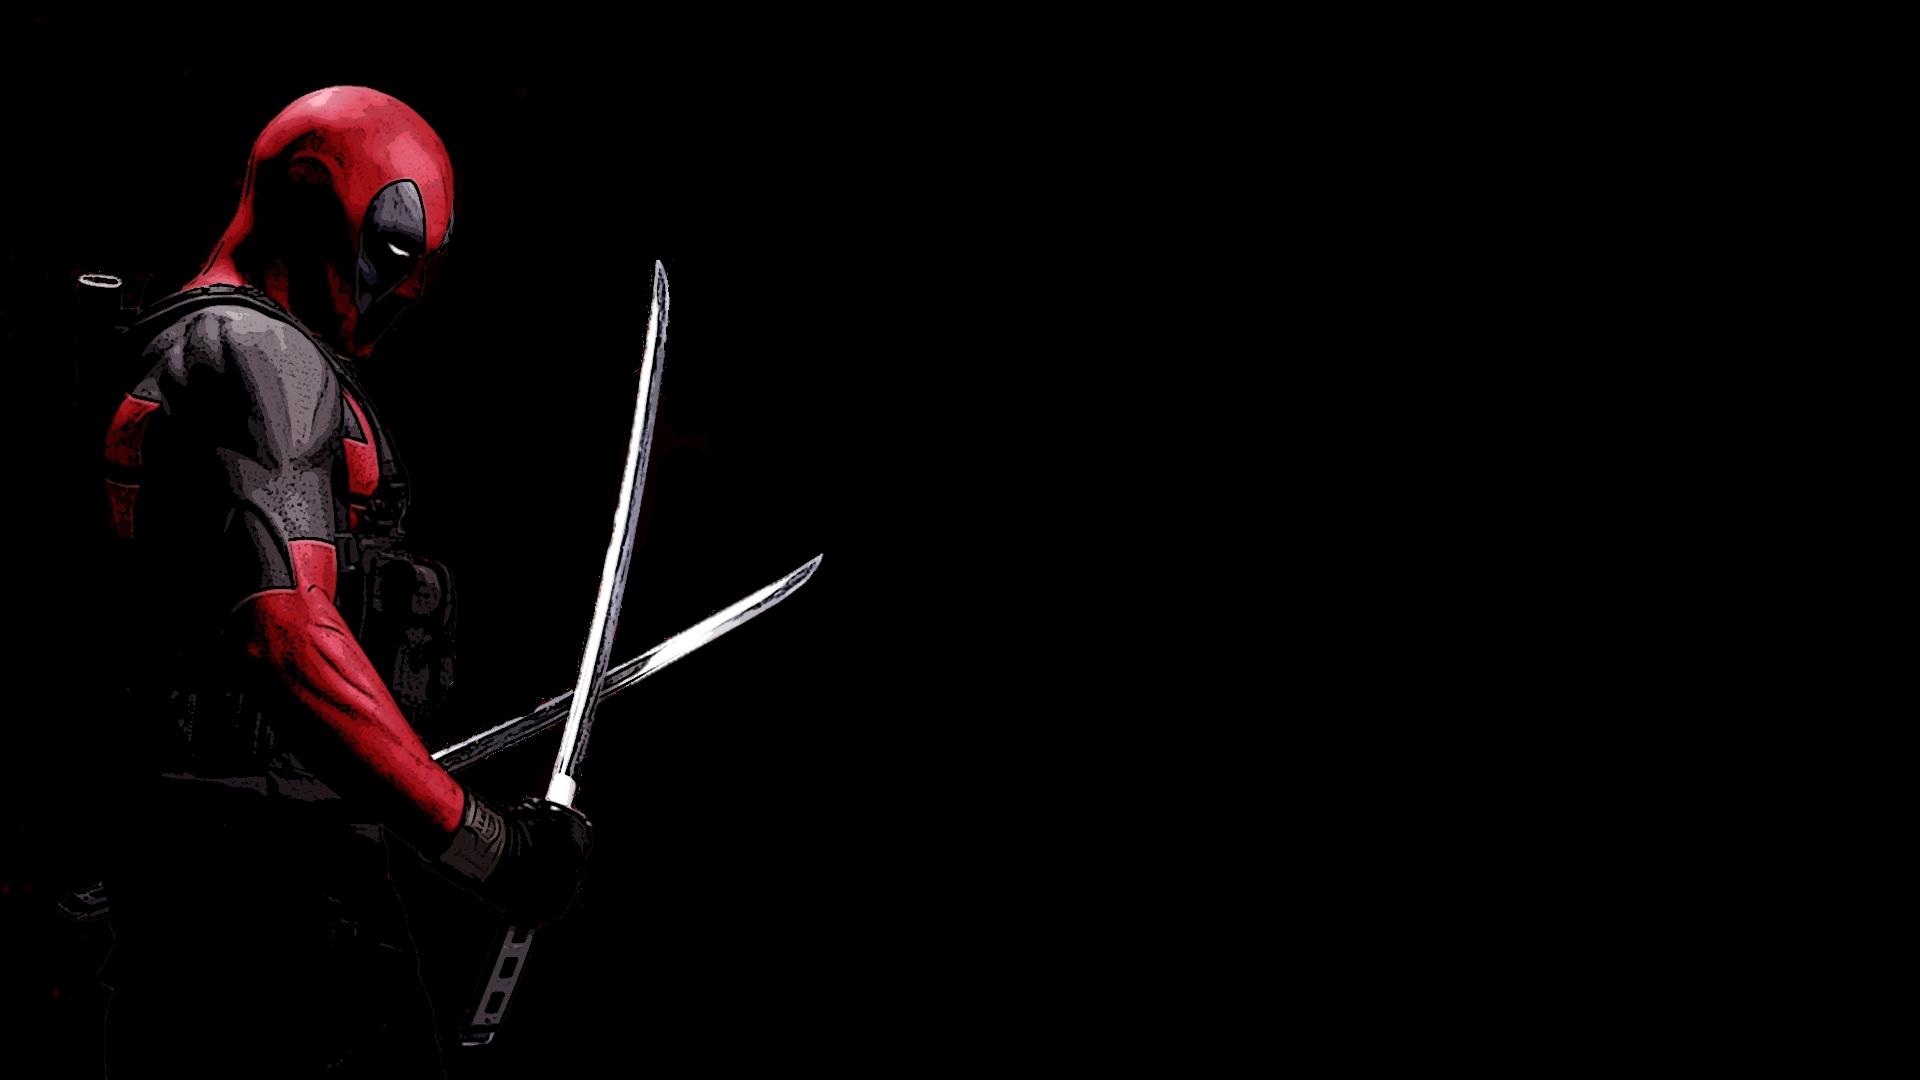 deadpool sword hd wallpaper | 1920x1080 | gludy